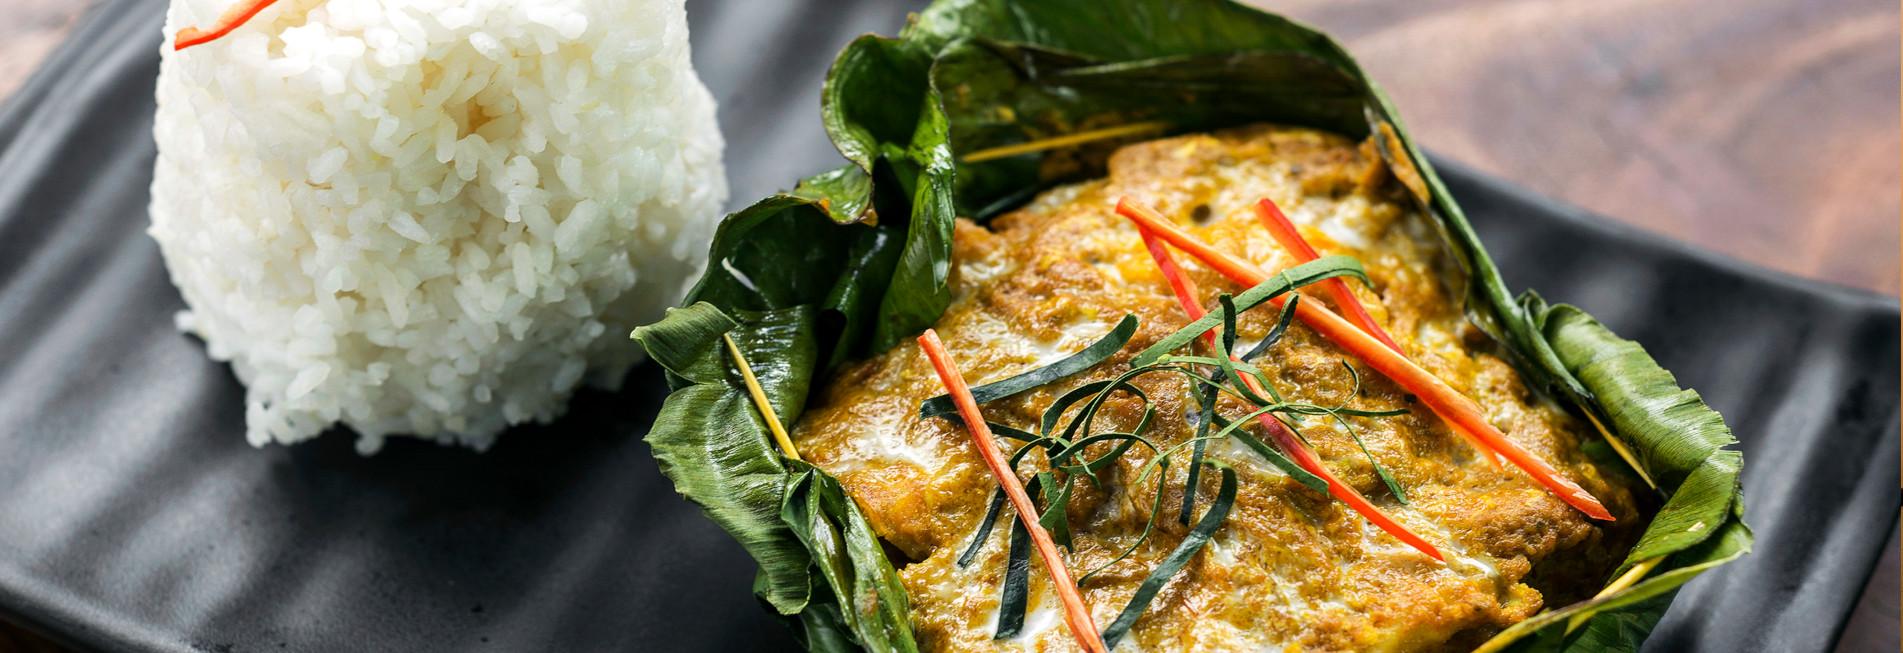 Traditionelles kambodschanisches Essen